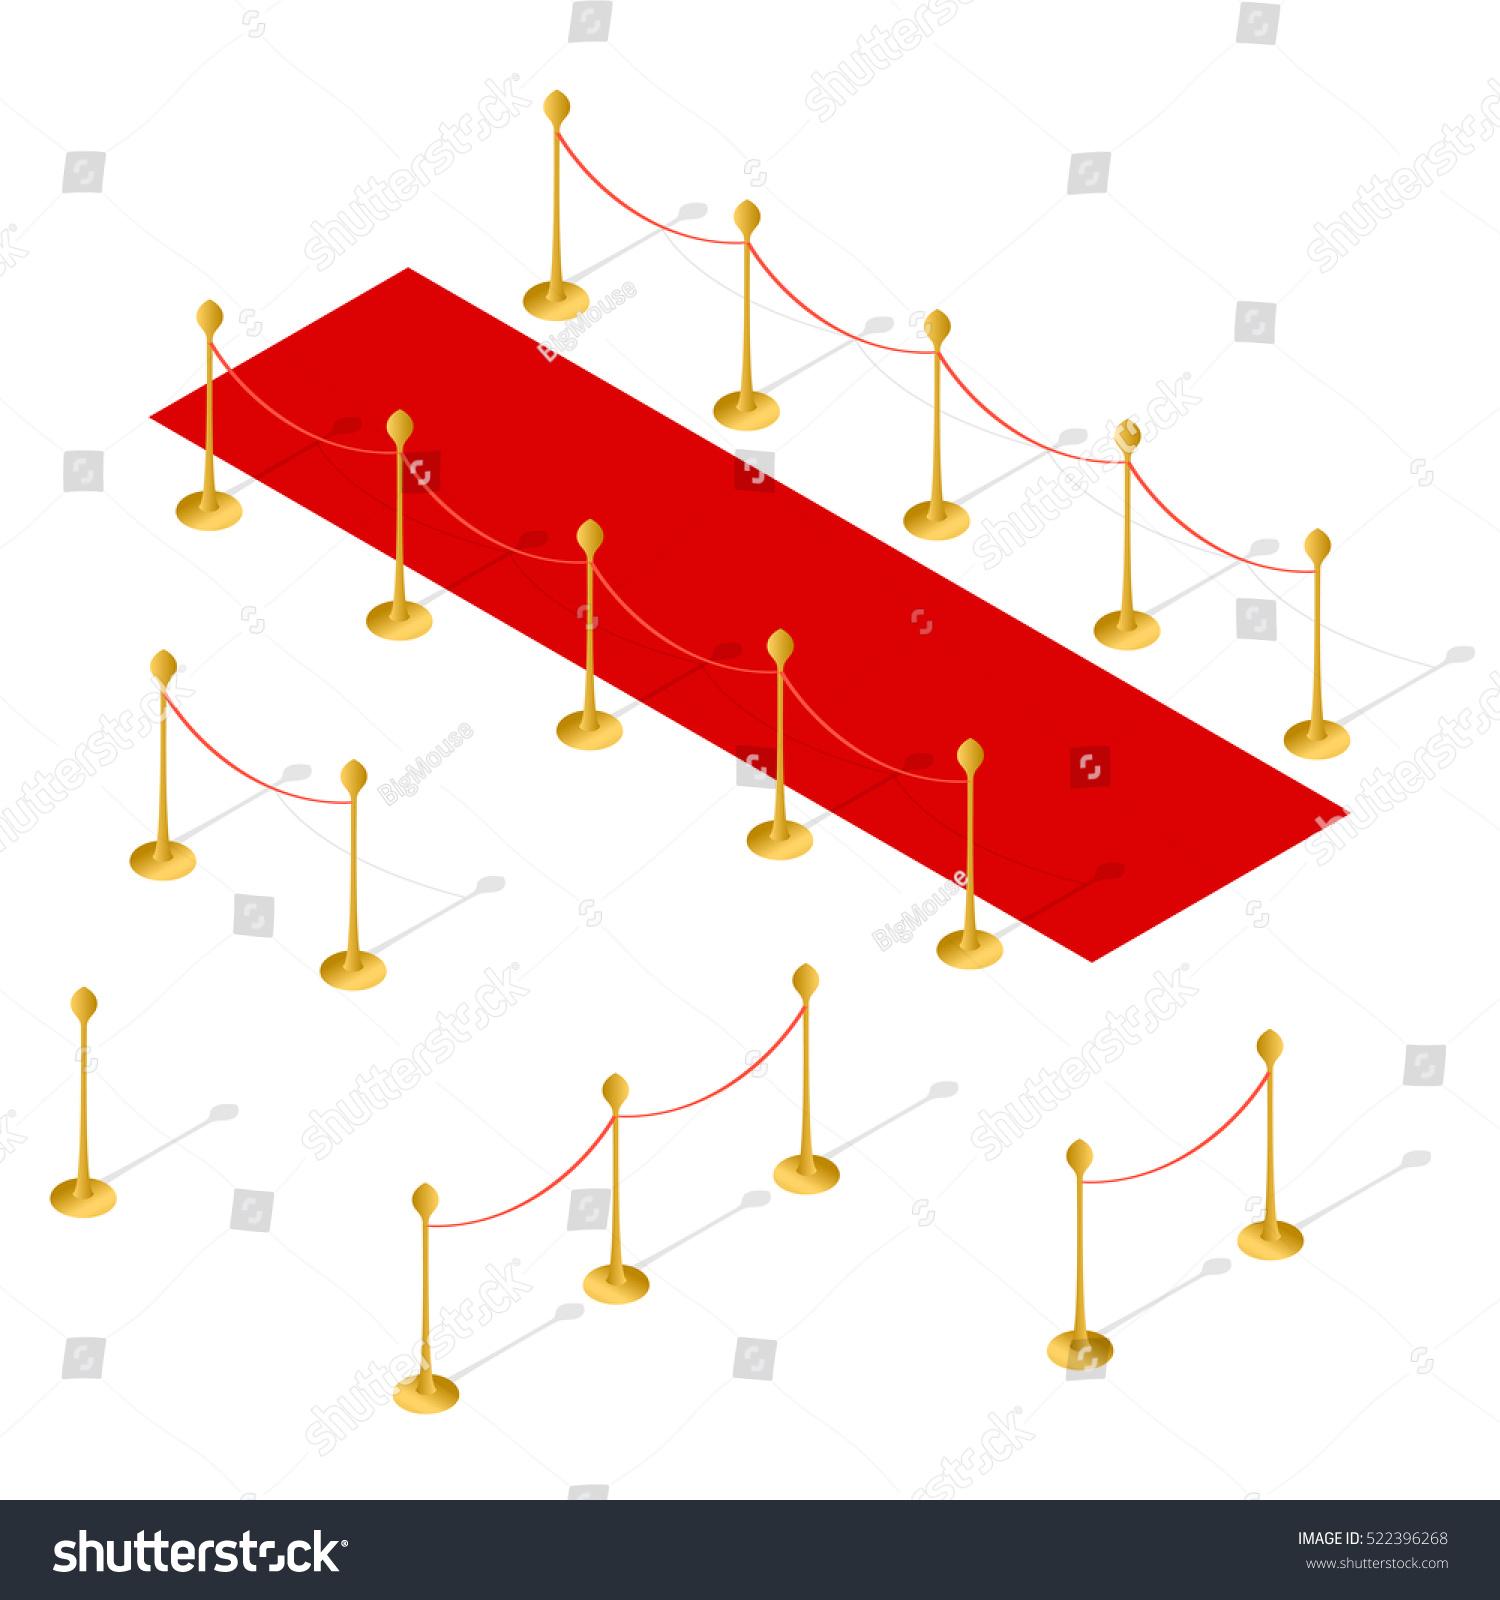 Red Carpet Rope Barrier Set Isometric Stock Vector